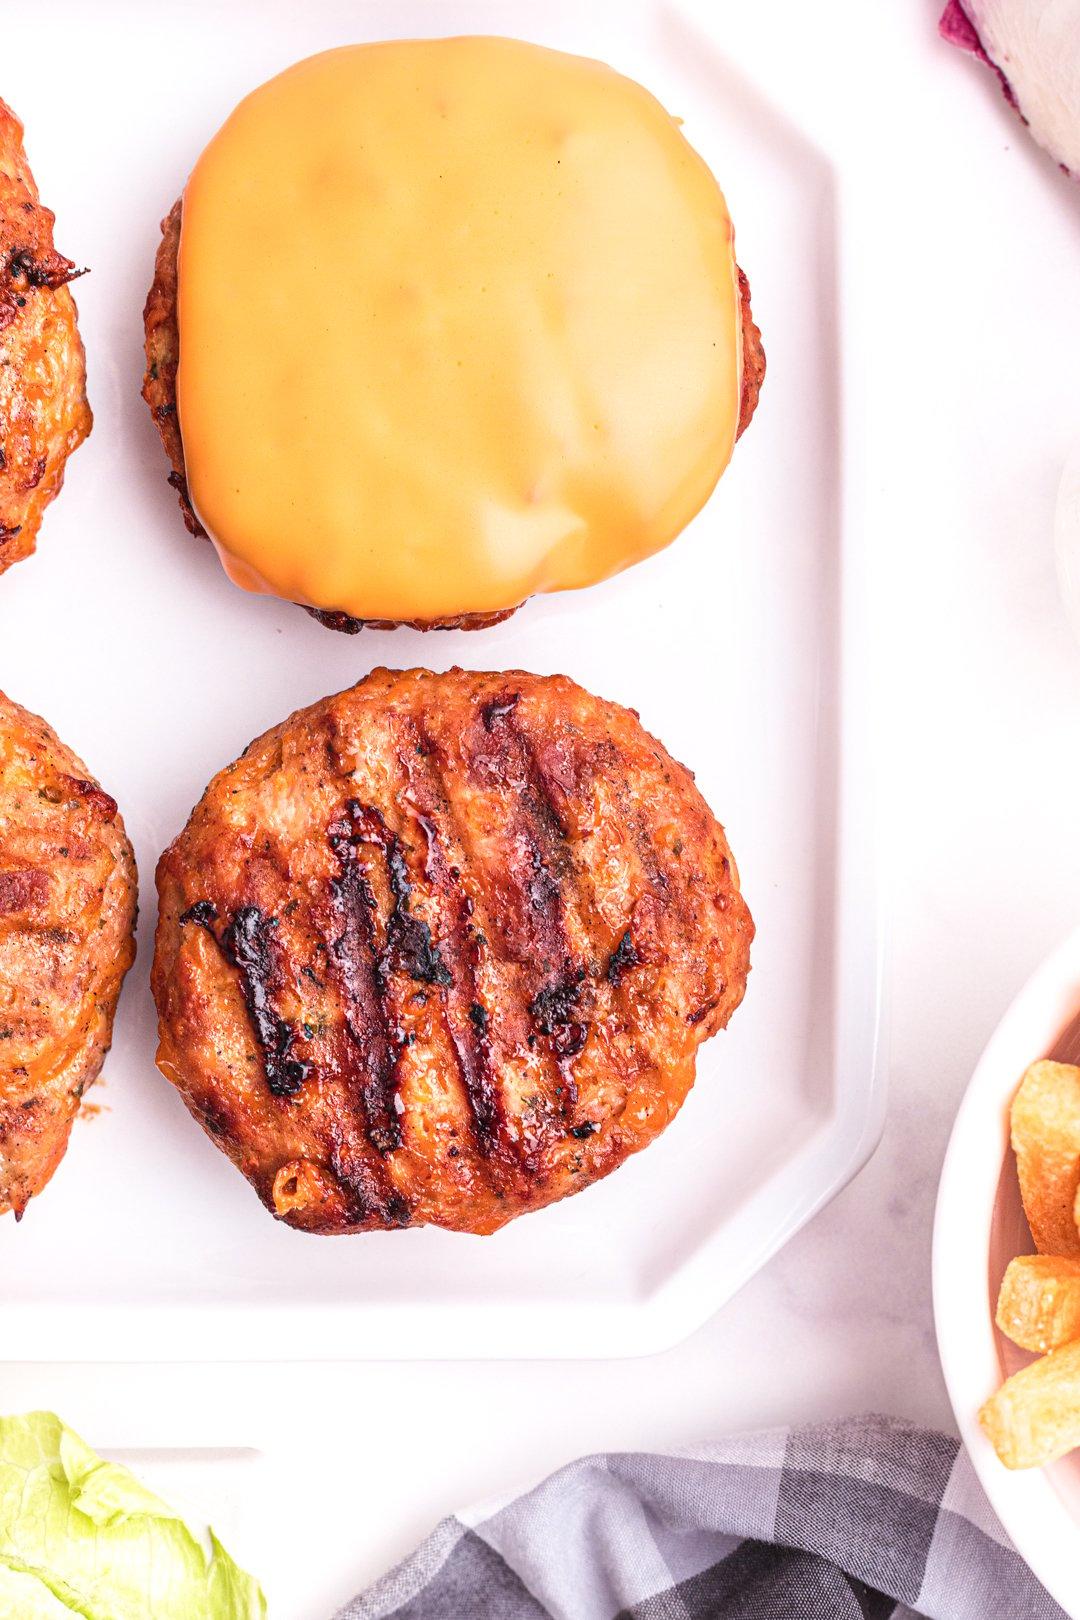 prepared grilled chicken patties on a serving platter